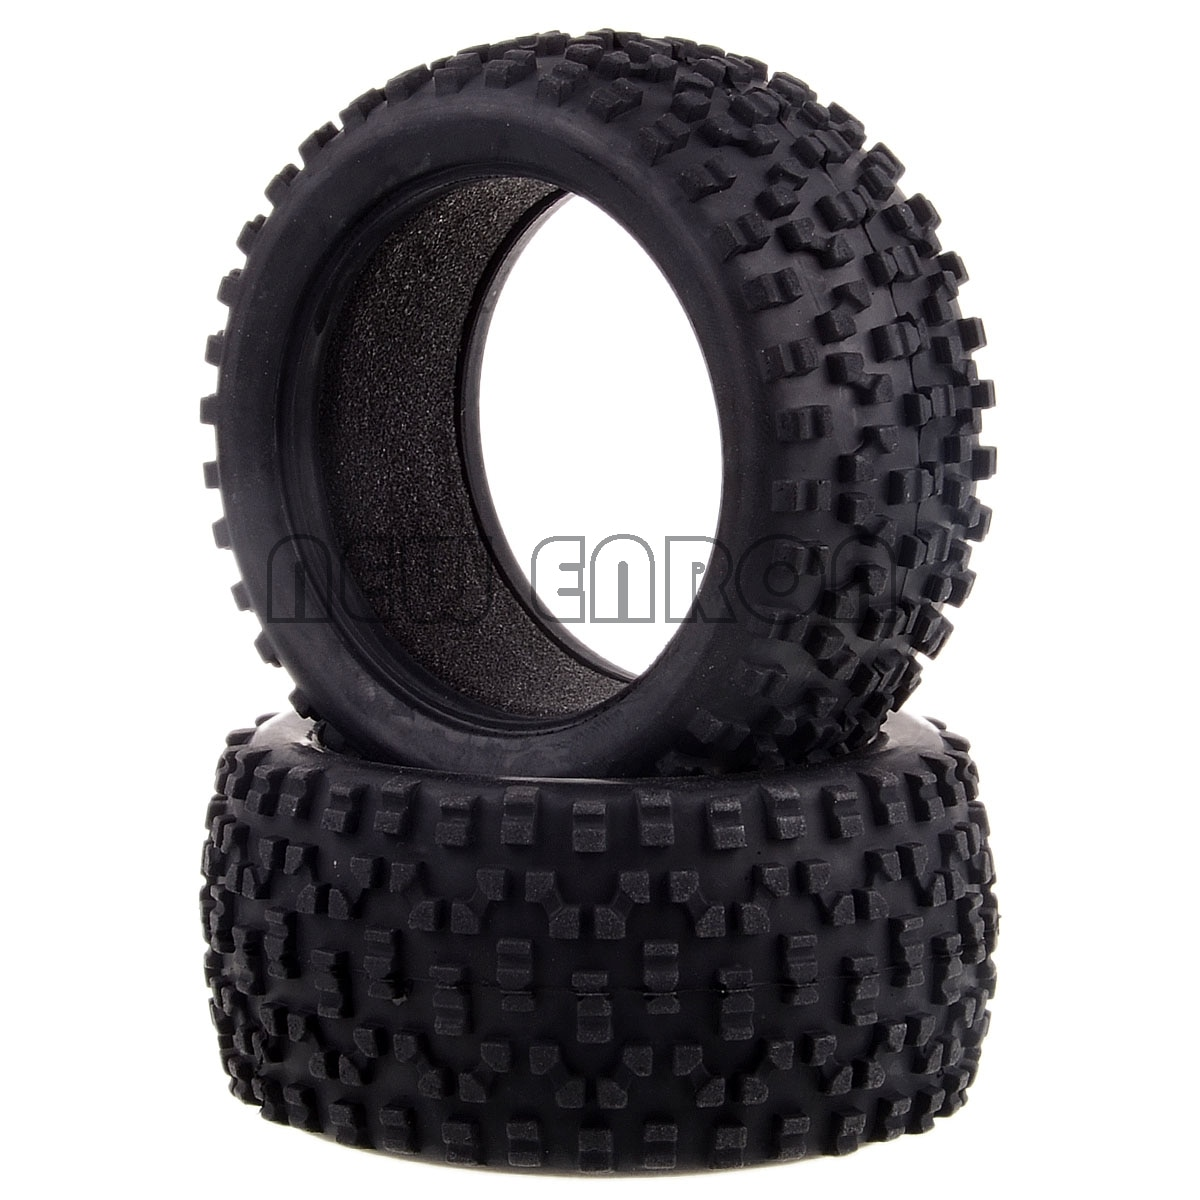 Nuevo ENRON 110 HSP 06025P neumático de rueda trasera 2p neumáticos para RC 1/10 escala para Himoto Nitro eléctrico RC Buggy